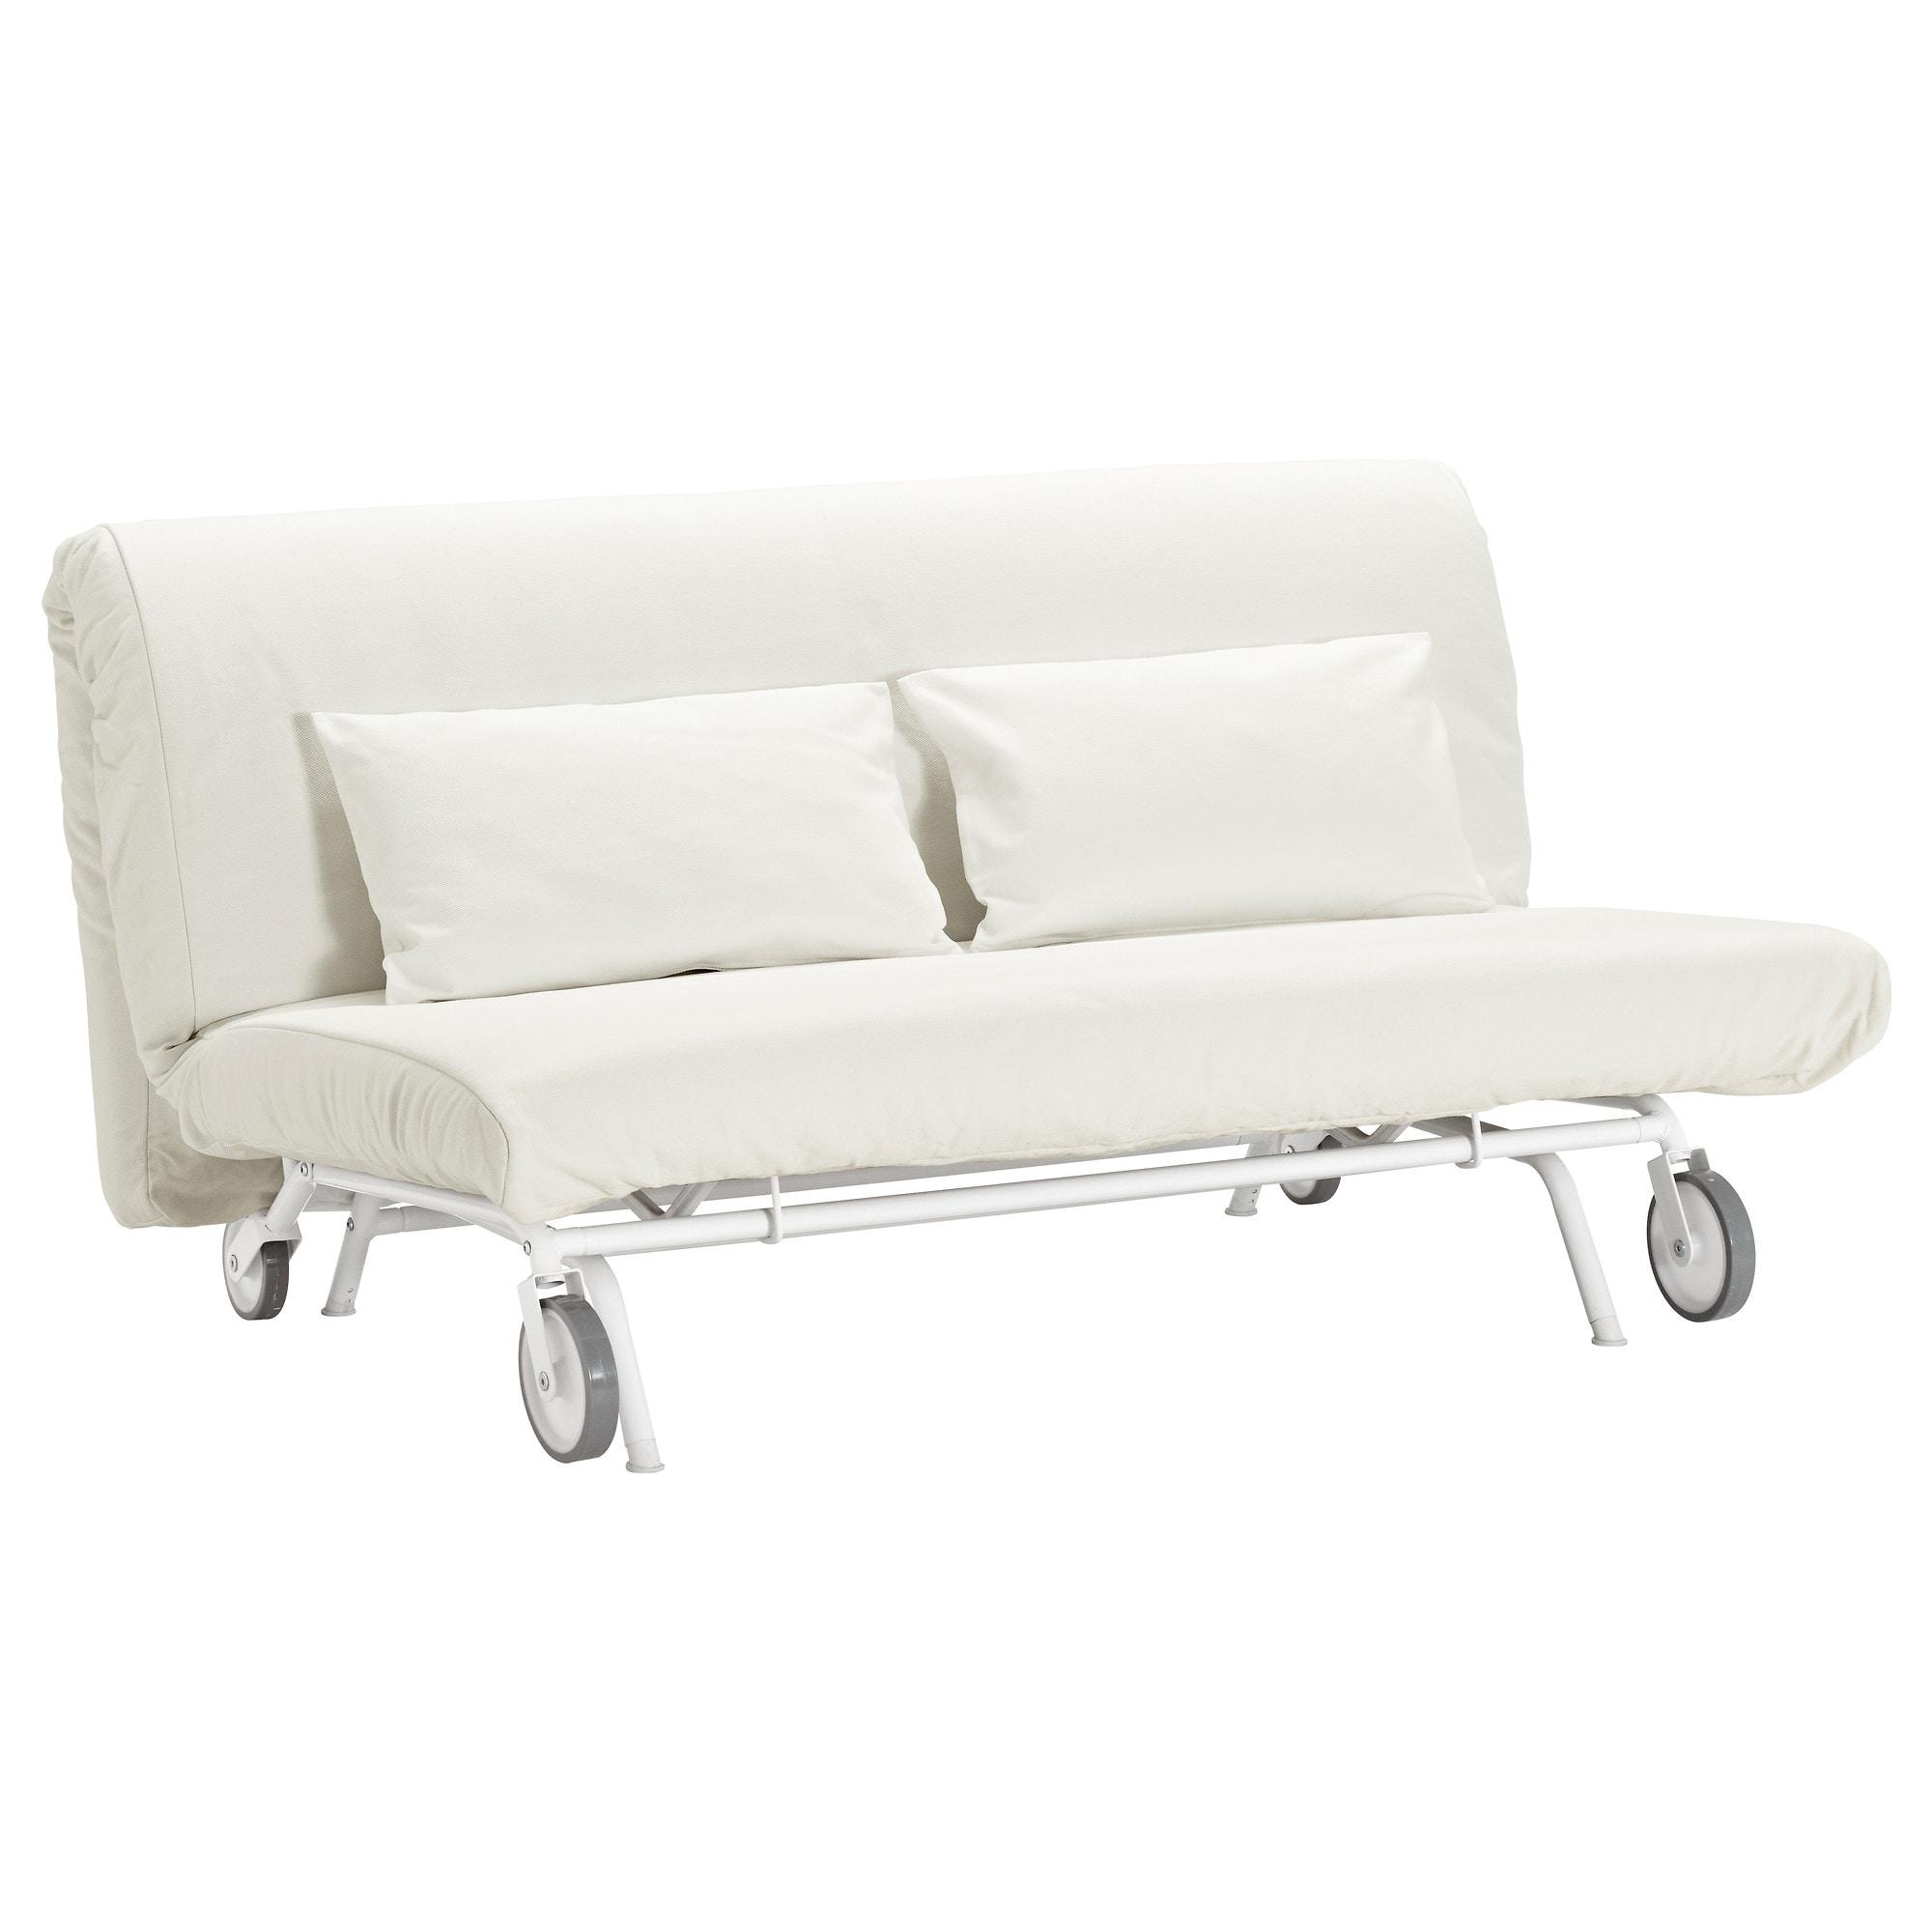 Ikea sofas Cama Ftd8 sofas Cama Ikea Troop118